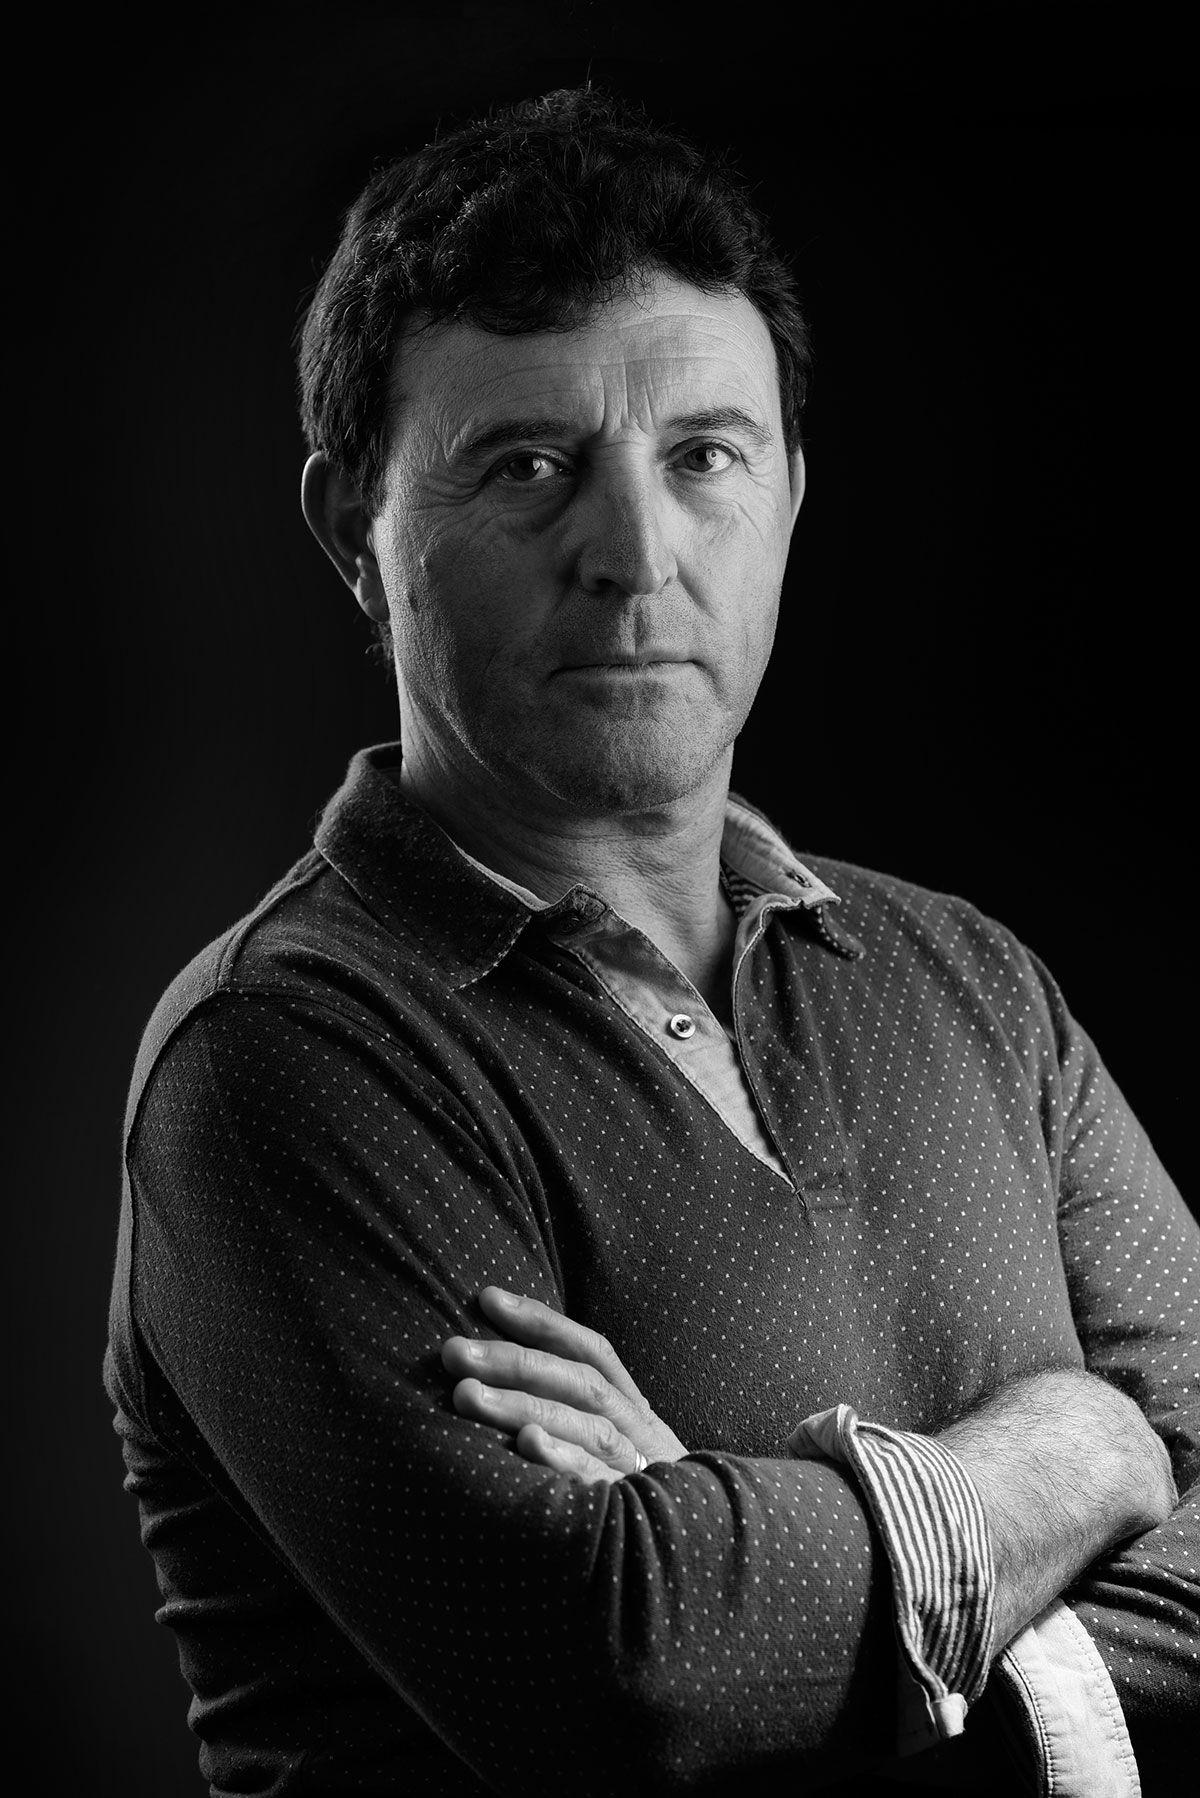 Juan Miguel Martínez Lorenzo